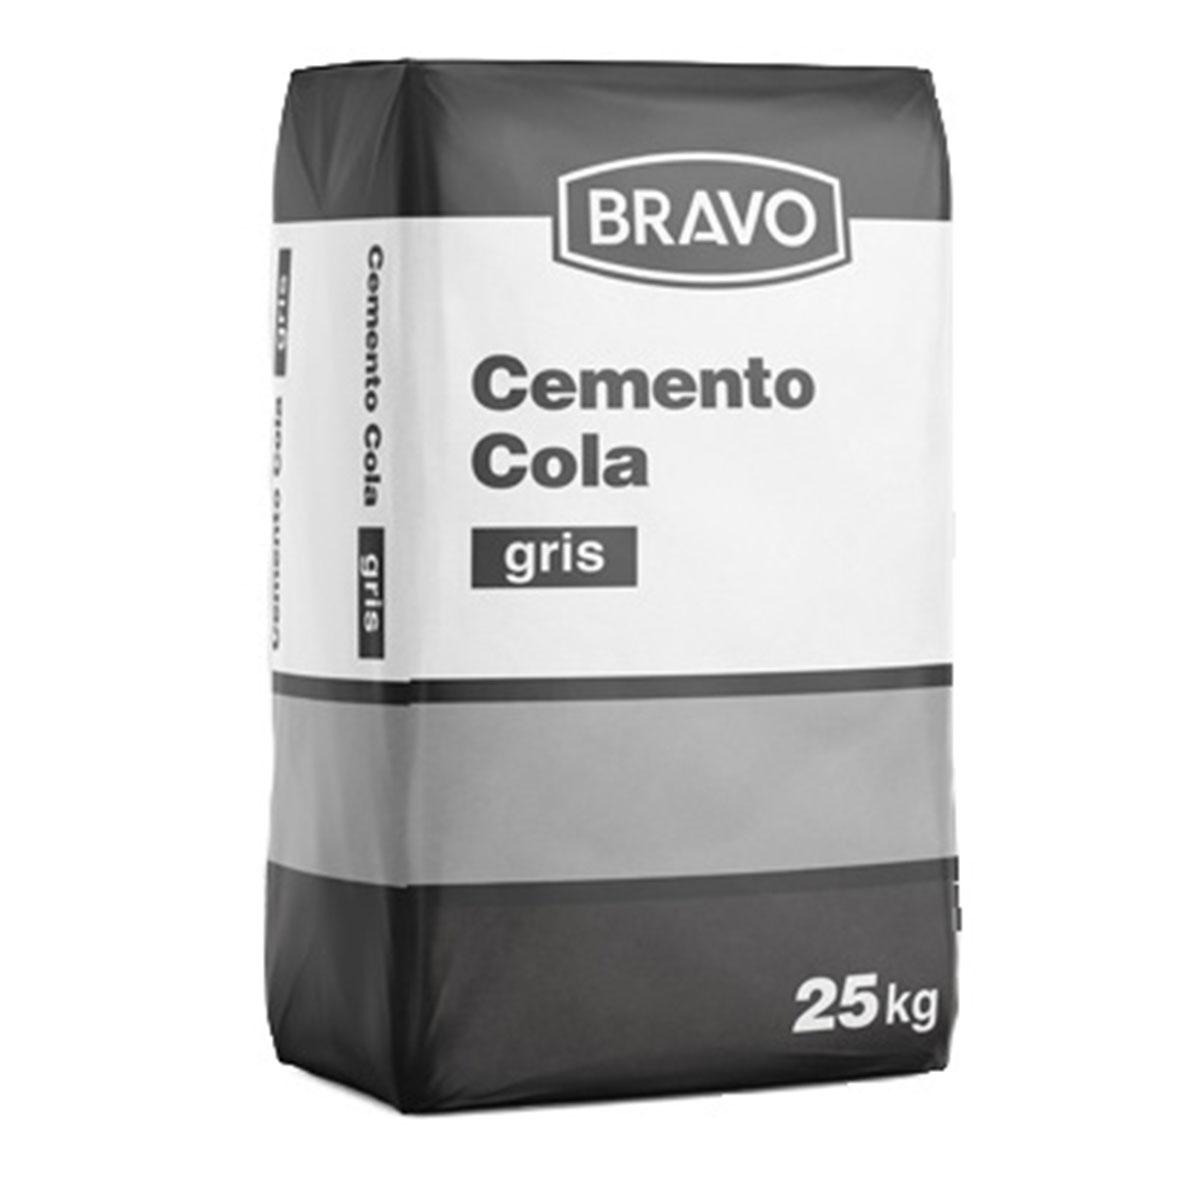 Cemento cola gris CE - Cementos cola - Marca Grupo Puma